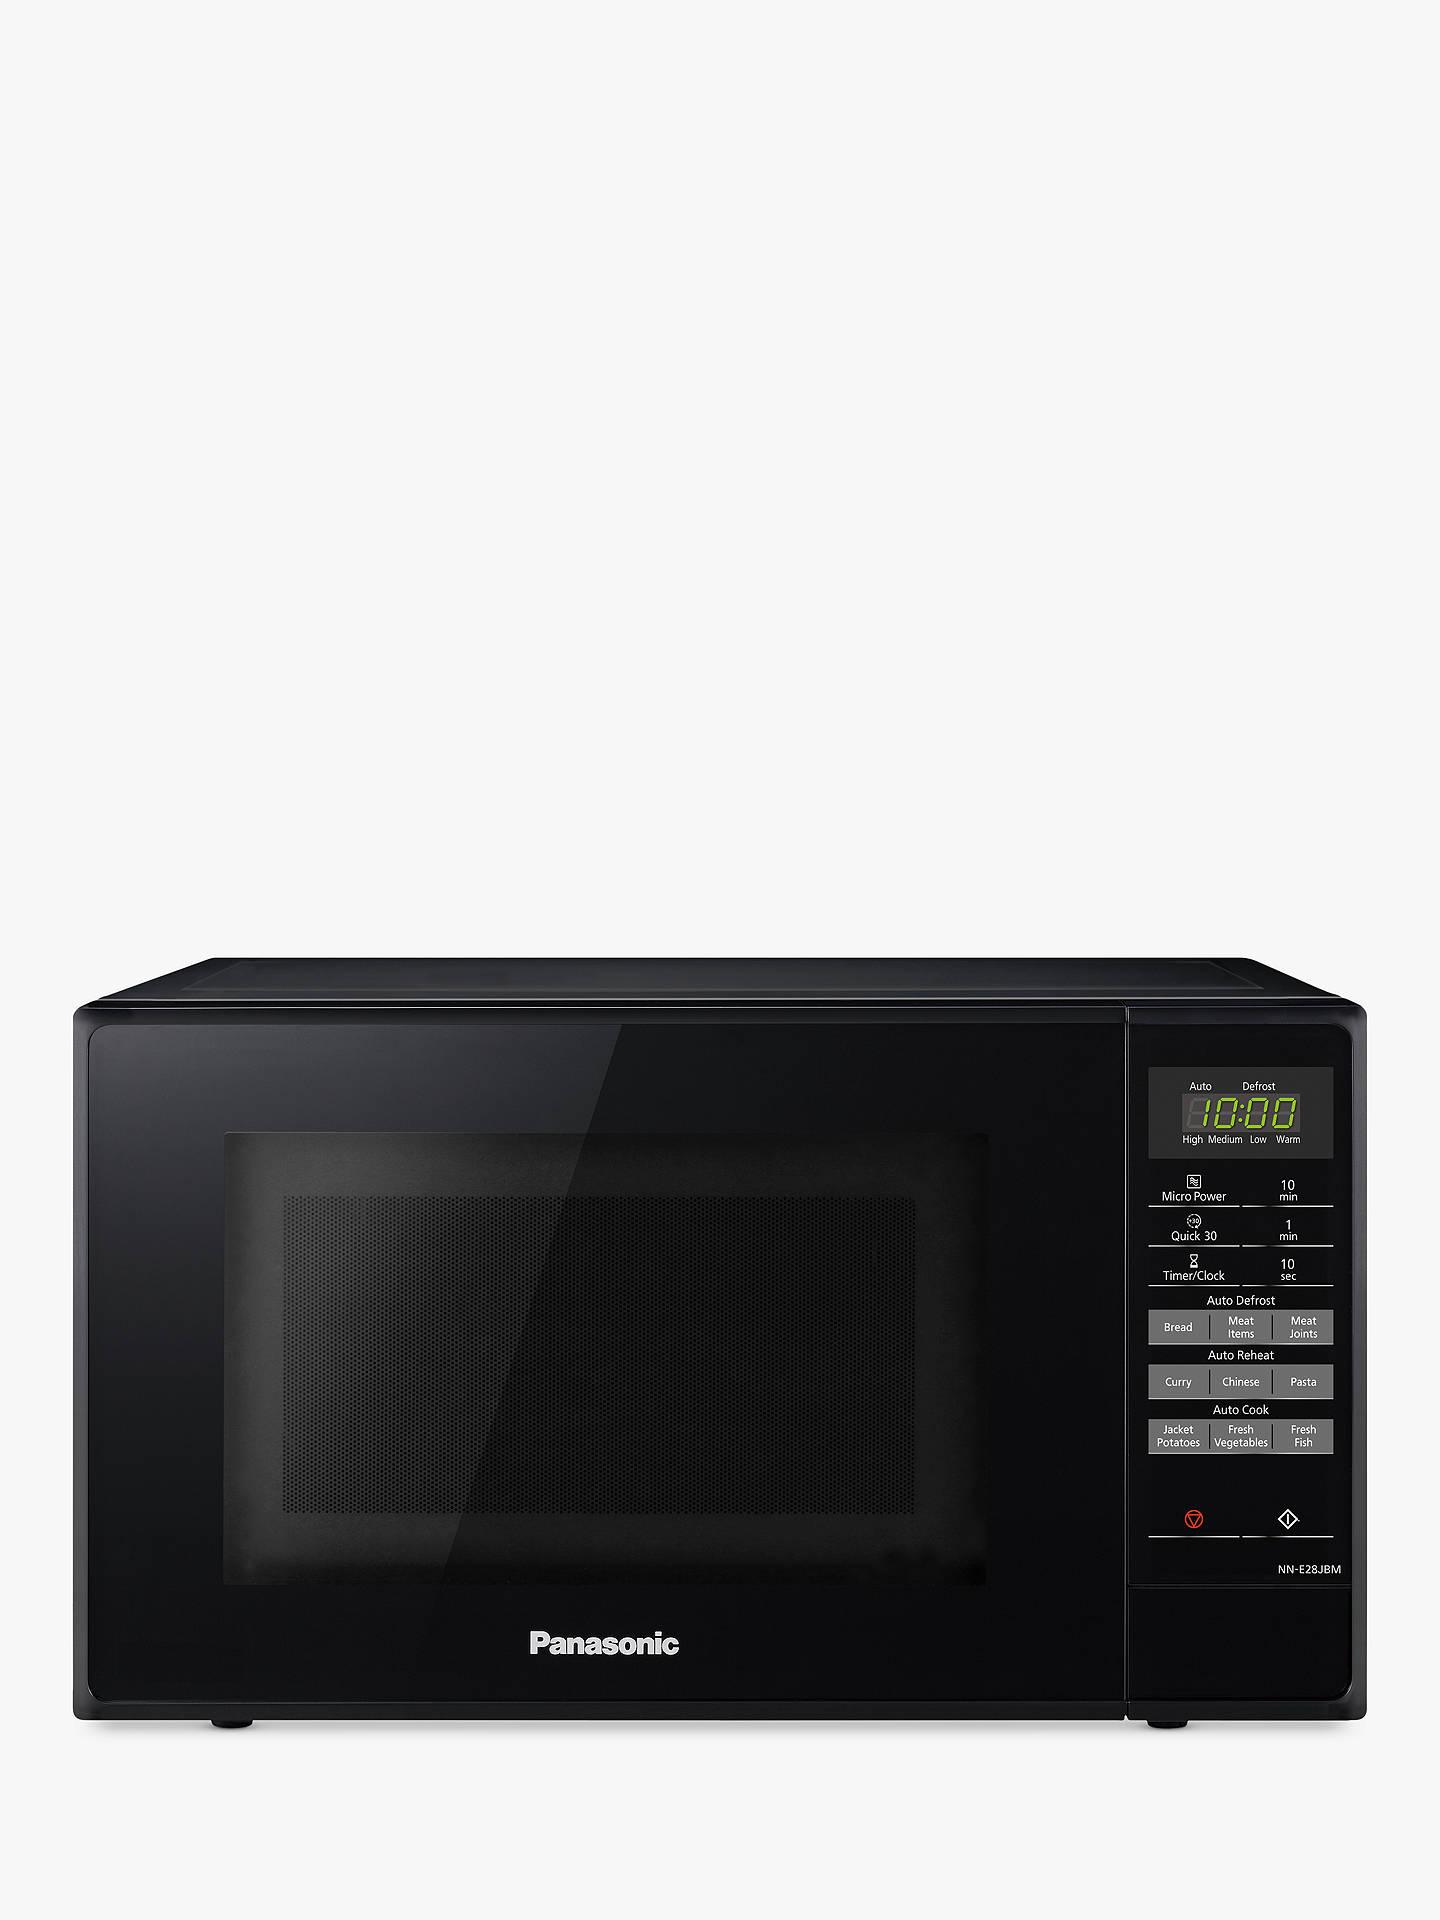 Panasonic Nn E28jbmbpq Microwave Oven Black Online At Johnlewis